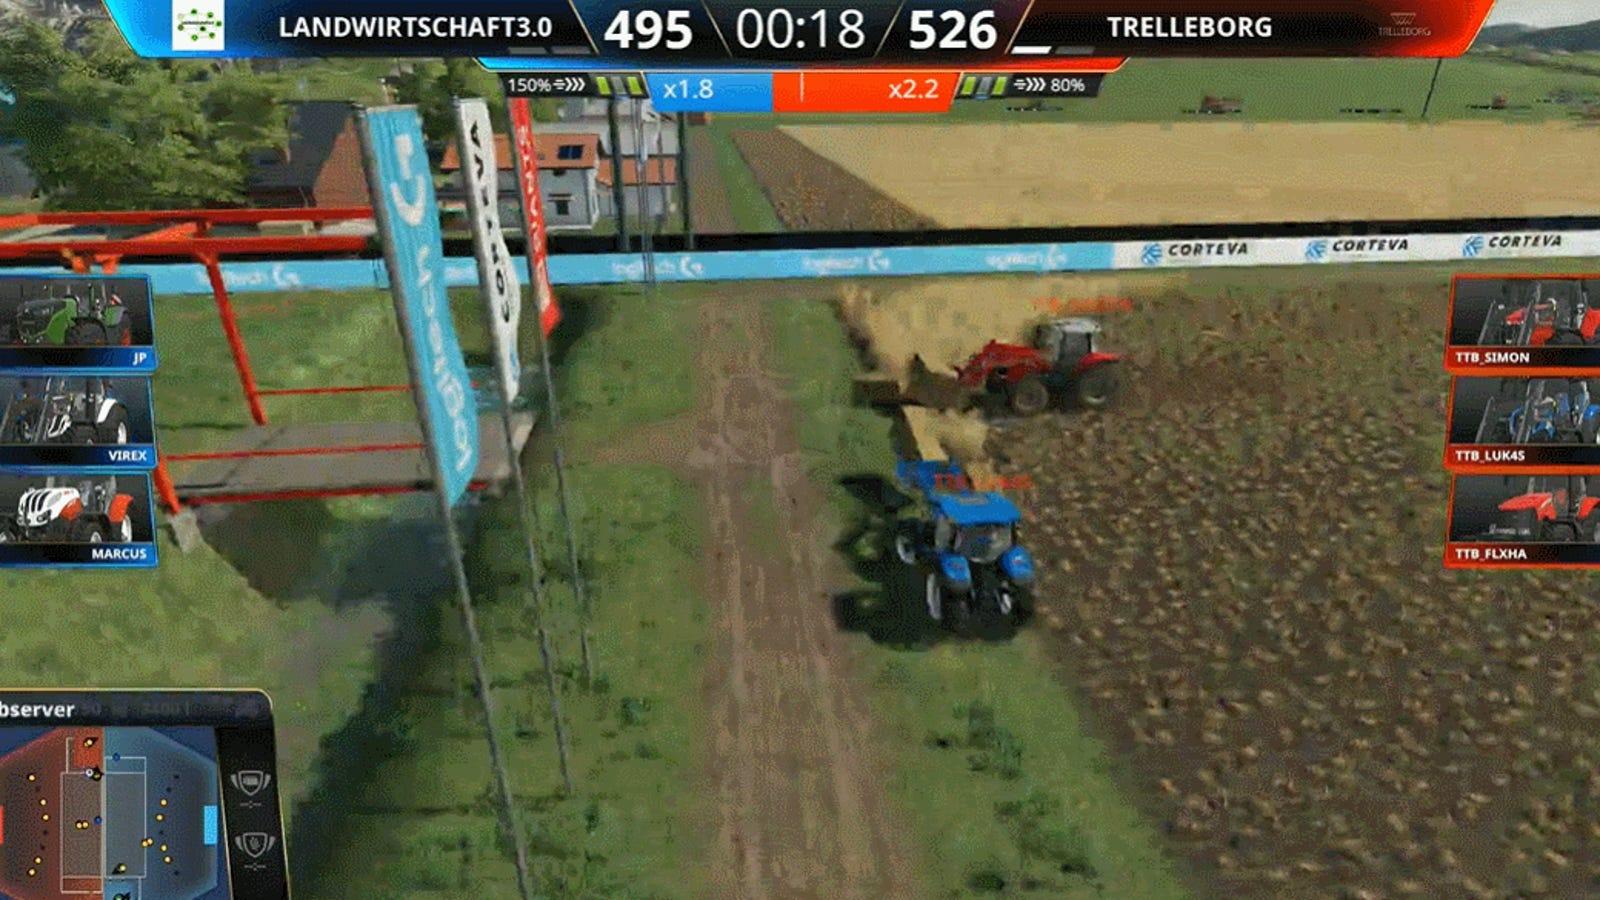 Competitive Farming Simulator Is Like An Adorable Tortoise Race